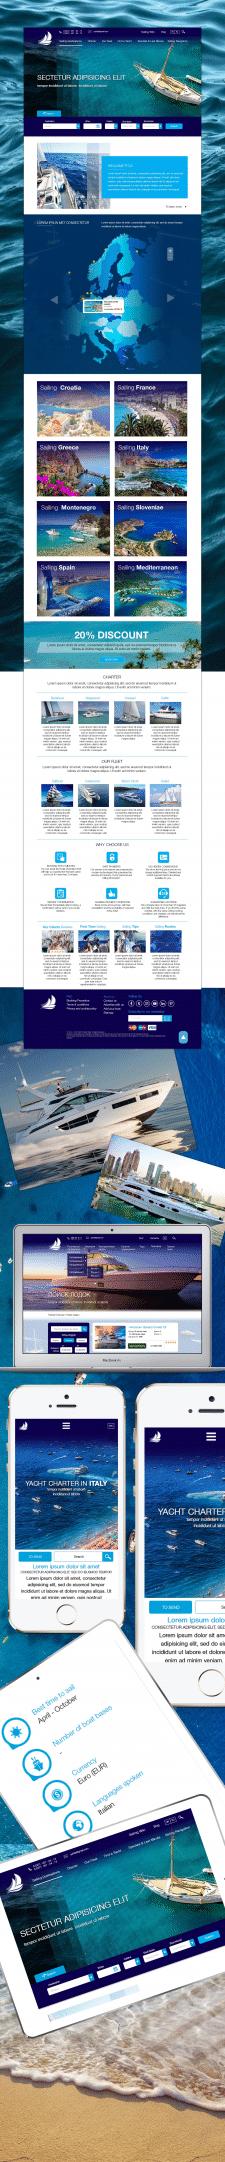 Разработка тревел портала Yacht Charter Line